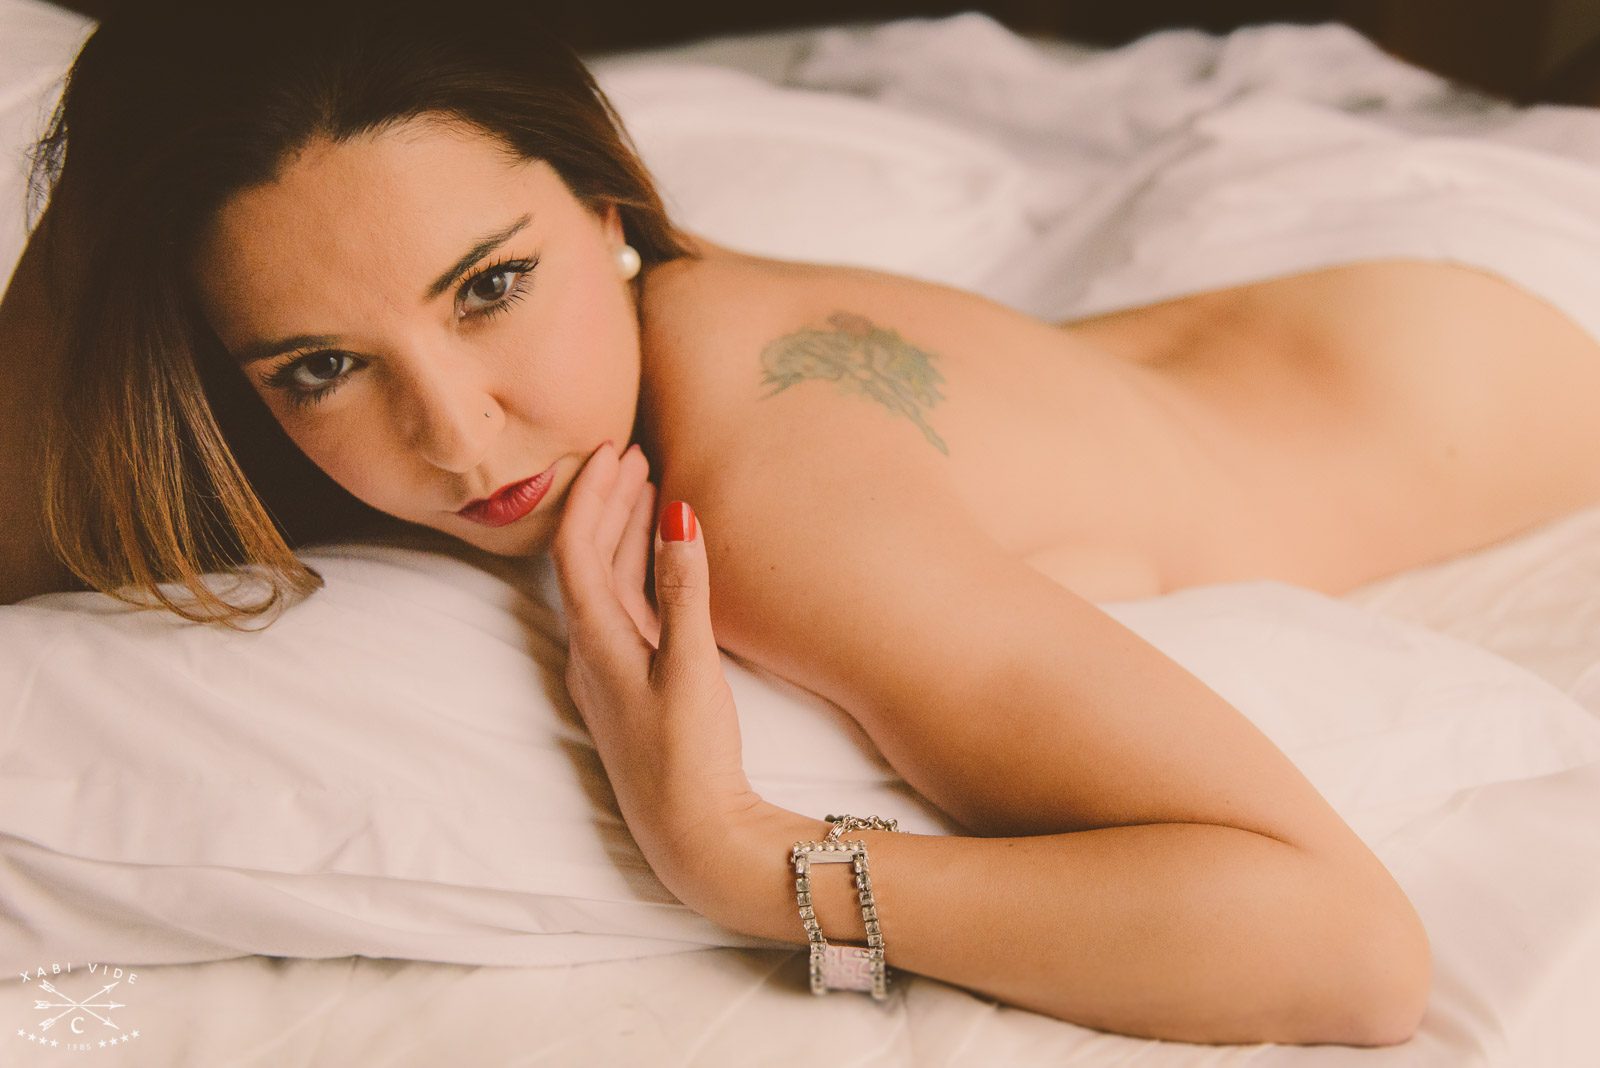 natalia_boudoir_xabivide-43